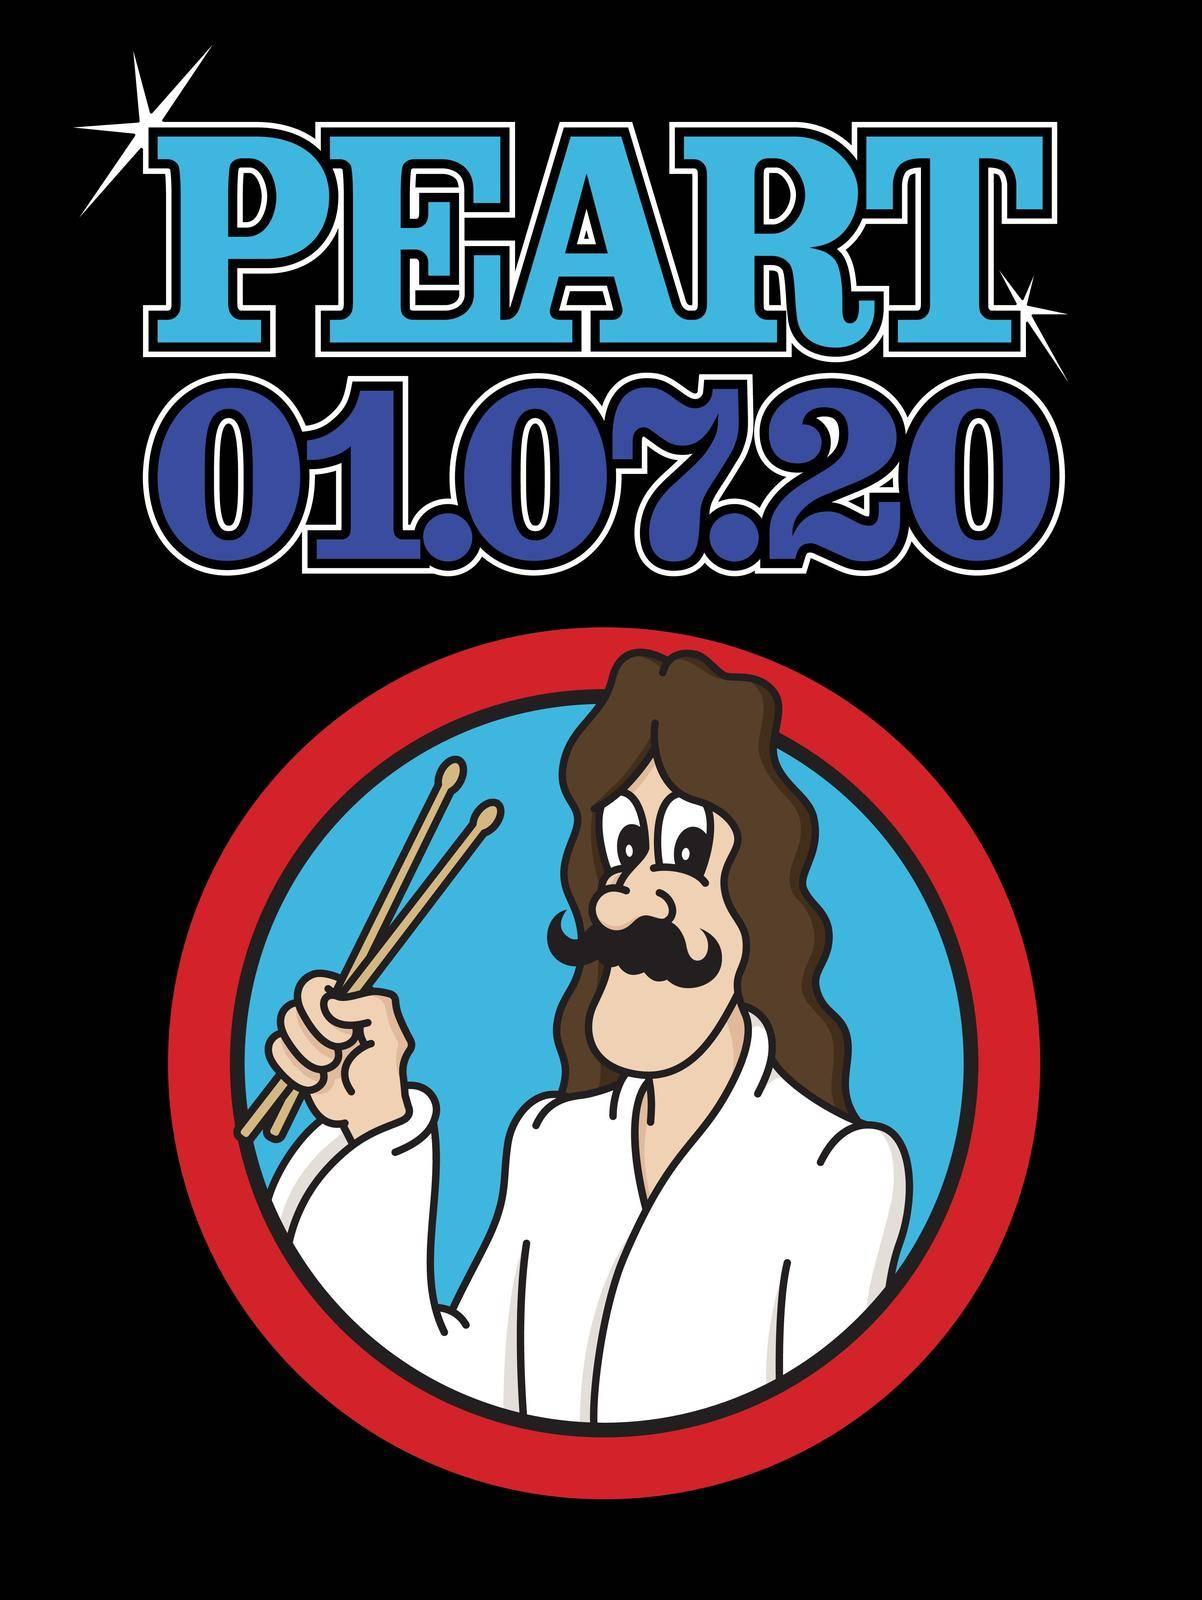 Commemorative cartoon illustration of rockstar Neil Peart. by fiftyfootelvis